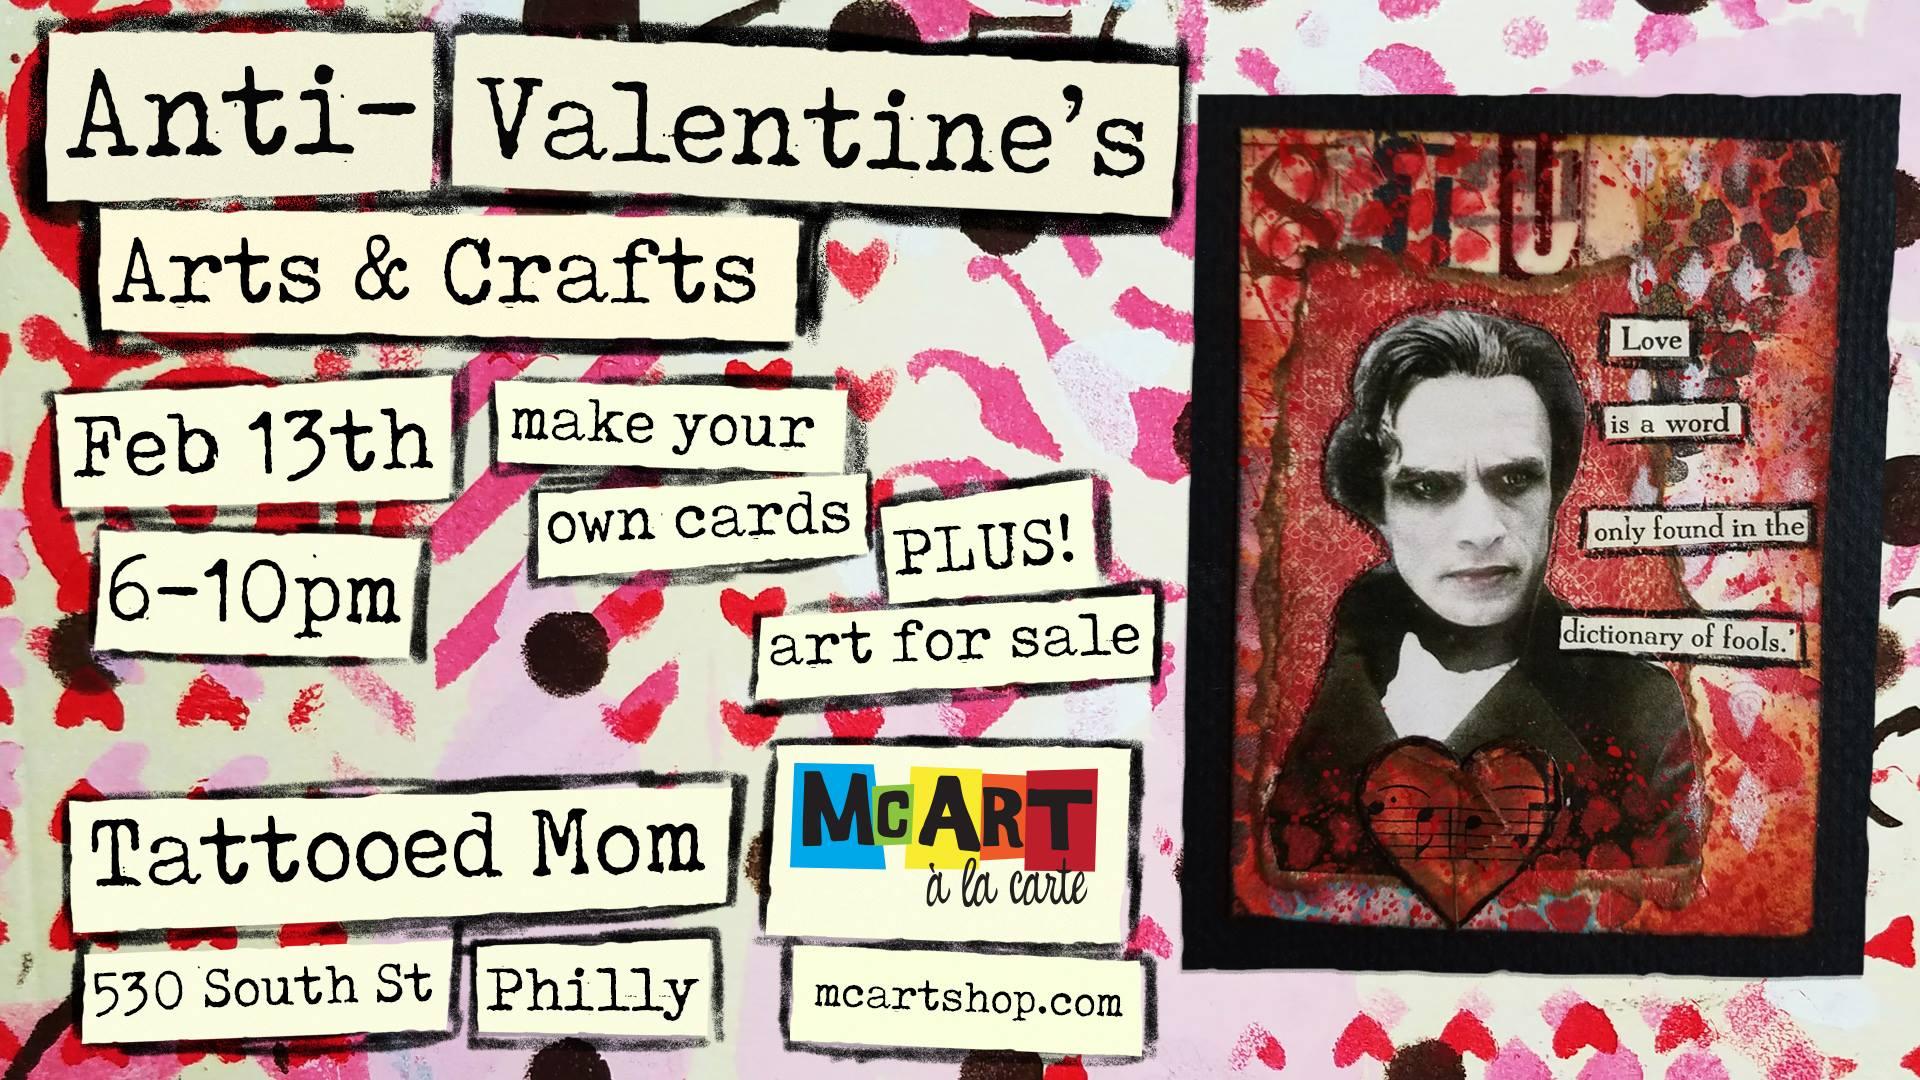 Anti-Valentine's Arts & Crafts - Tattooed Mom